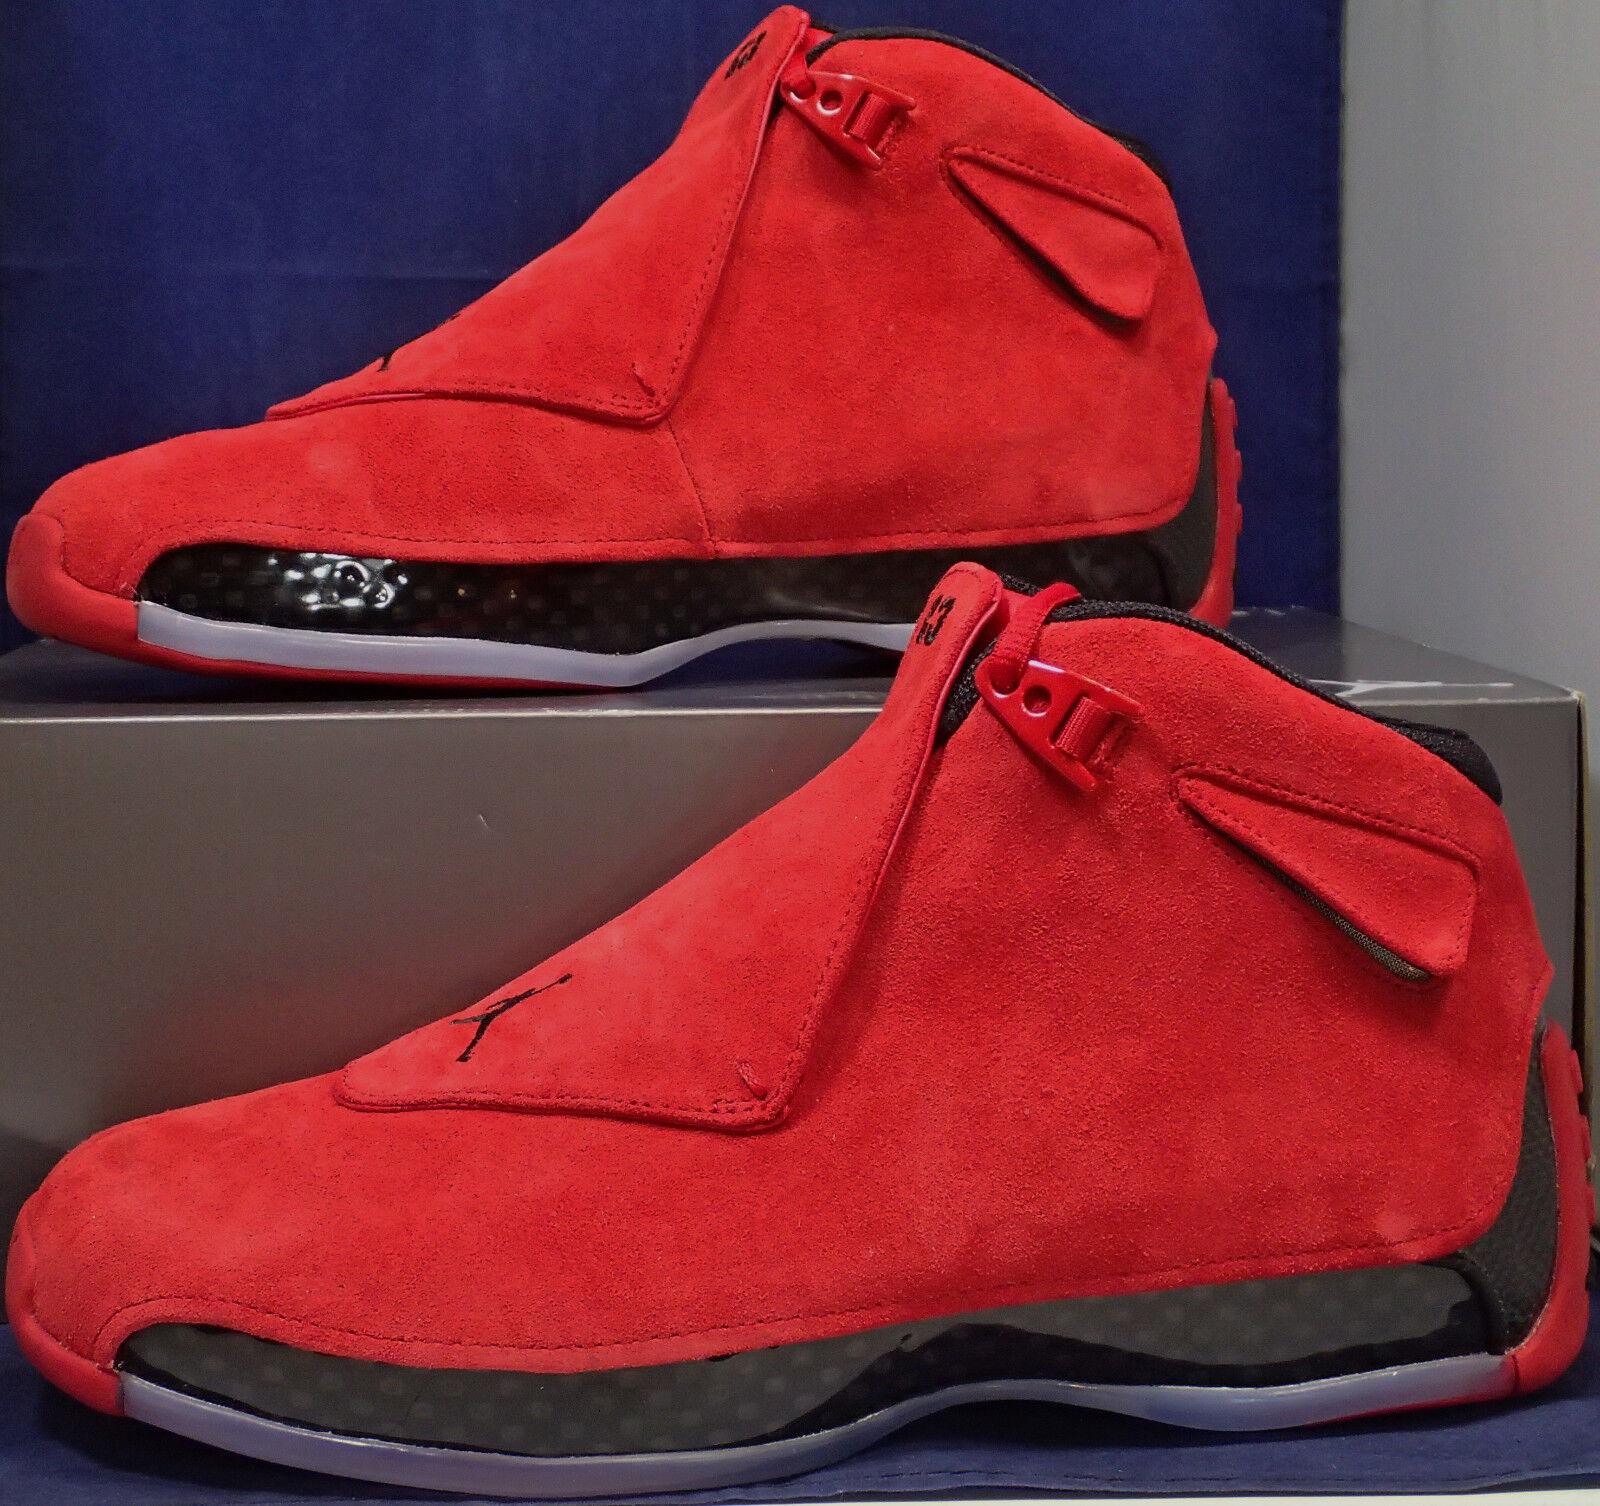 Nike Air Jordan 18 XVIII Retro TGold Turnhalle Rot Schwarzes Veloursleder Sz 10.5 Frei